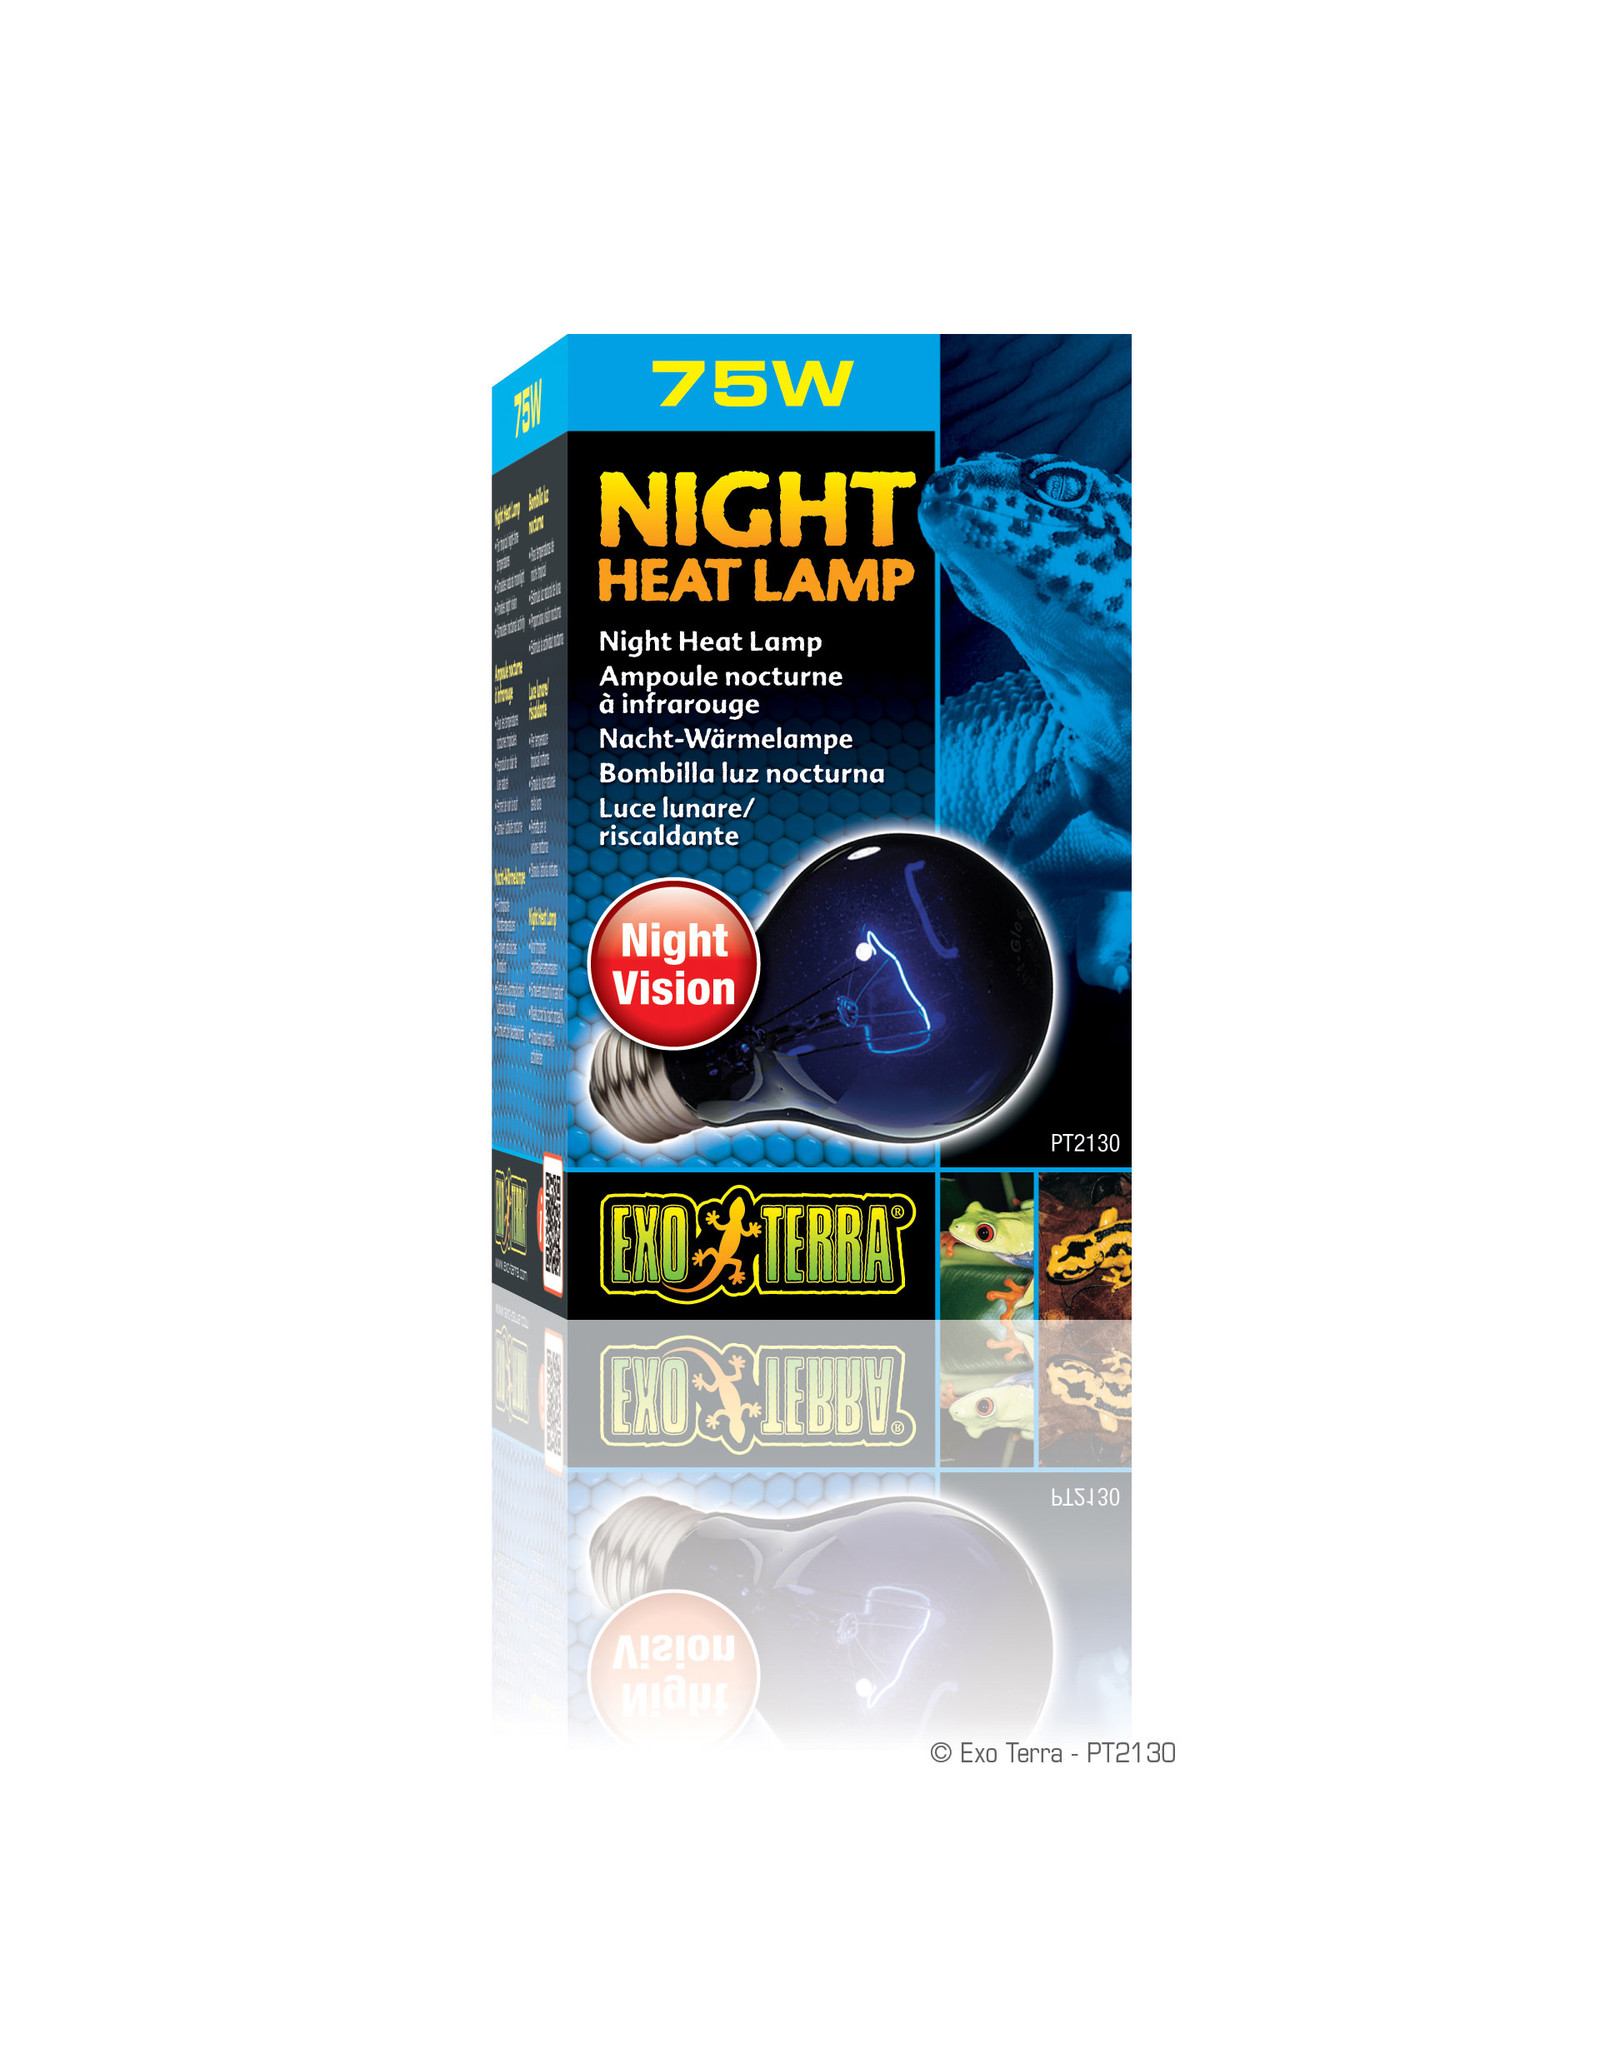 Exo Terra Night Heat Lamp - A19 / 75W